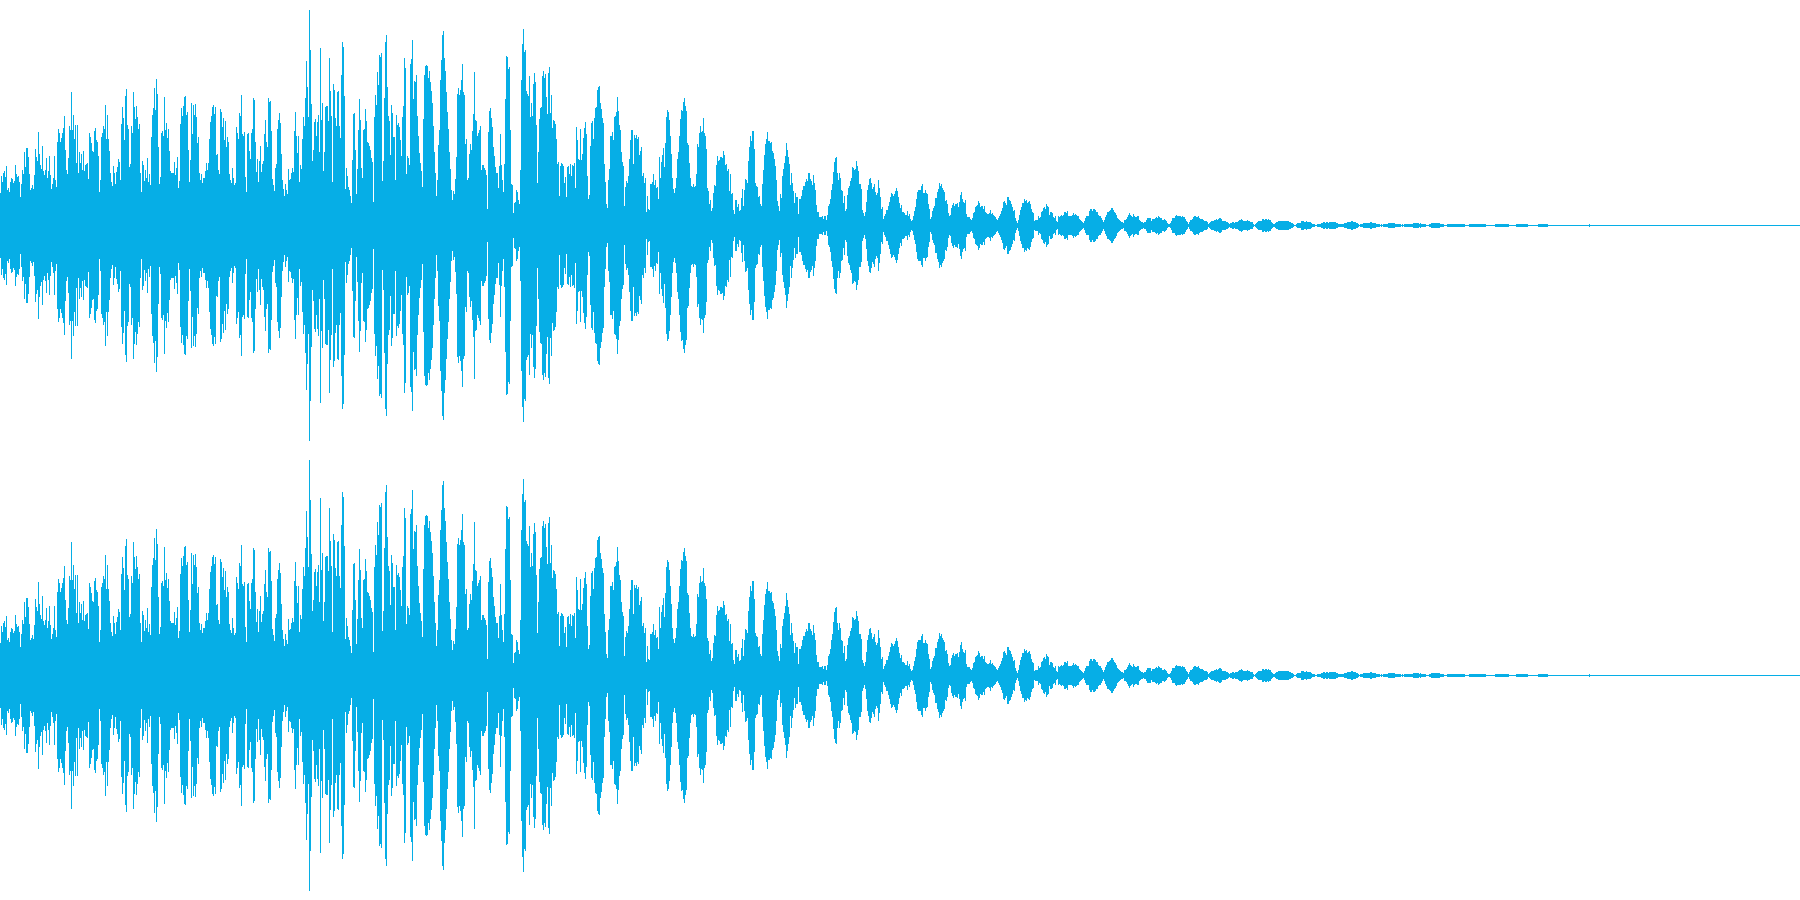 SFメカの挙動、足音などのイメージの再生済みの波形